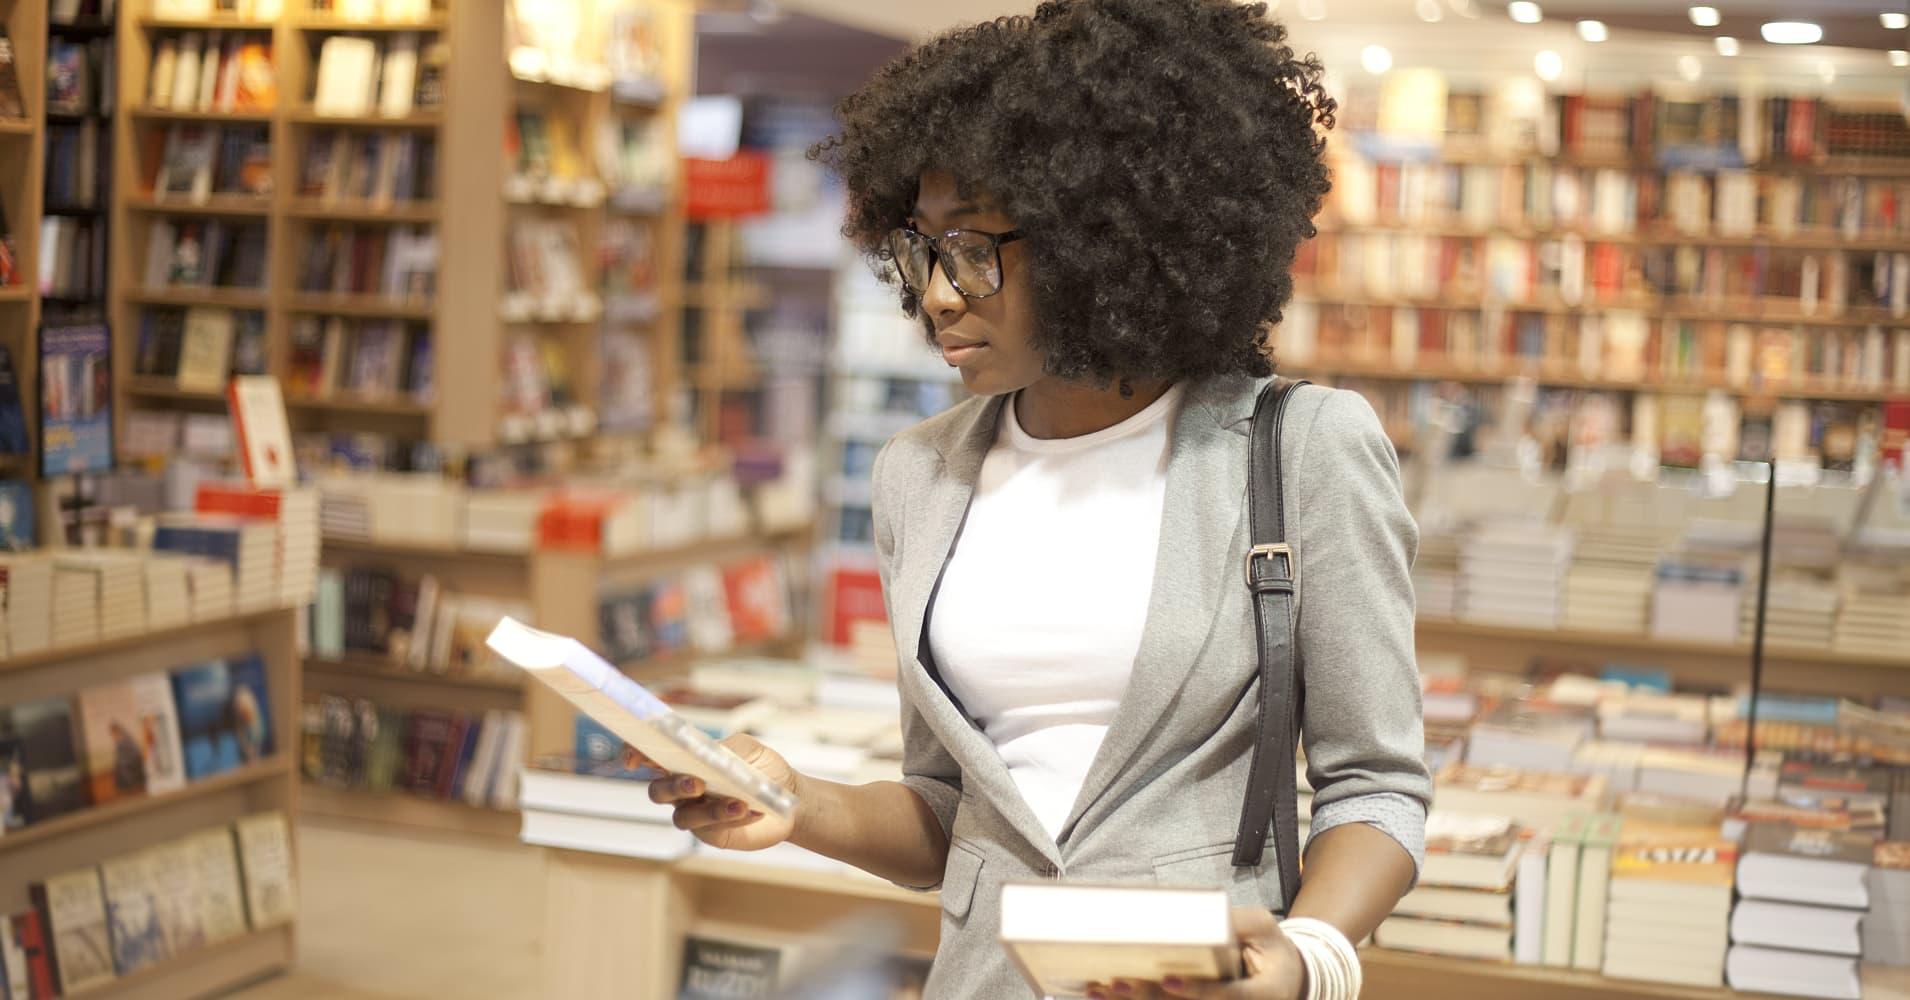 Top business authors share their greatest leadership advice